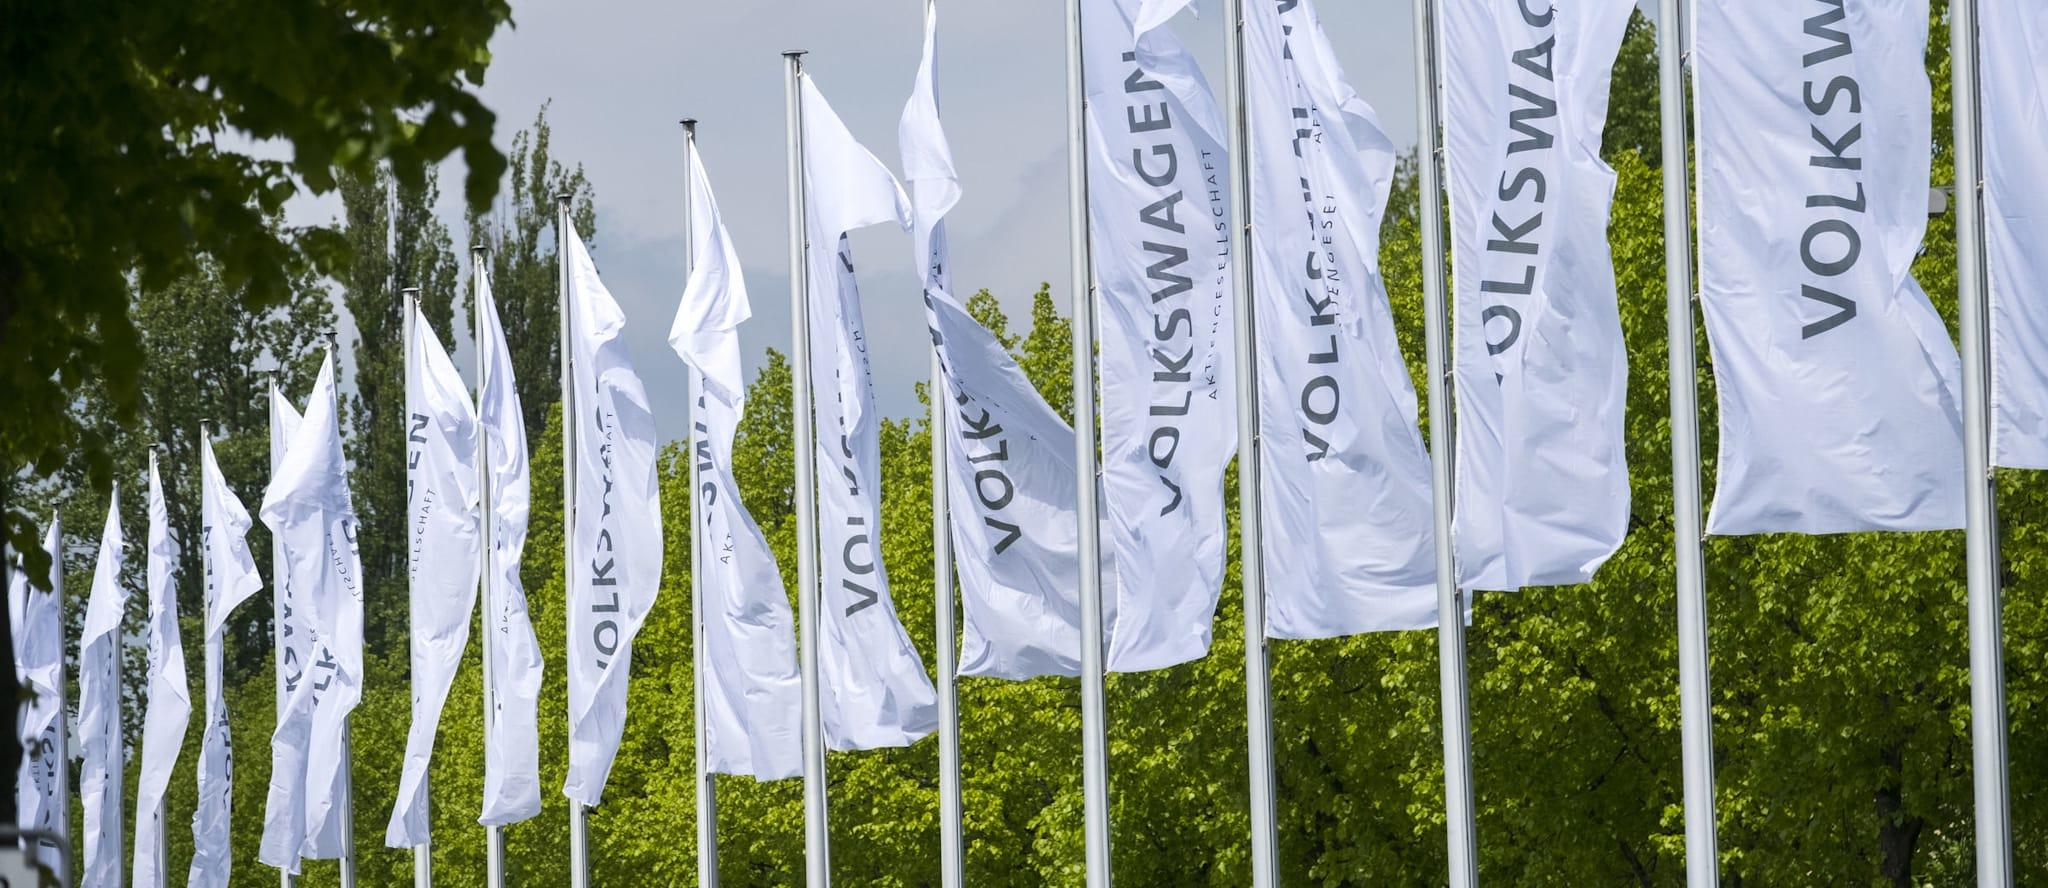 Europcar 将由大众领导的投资者集团收购